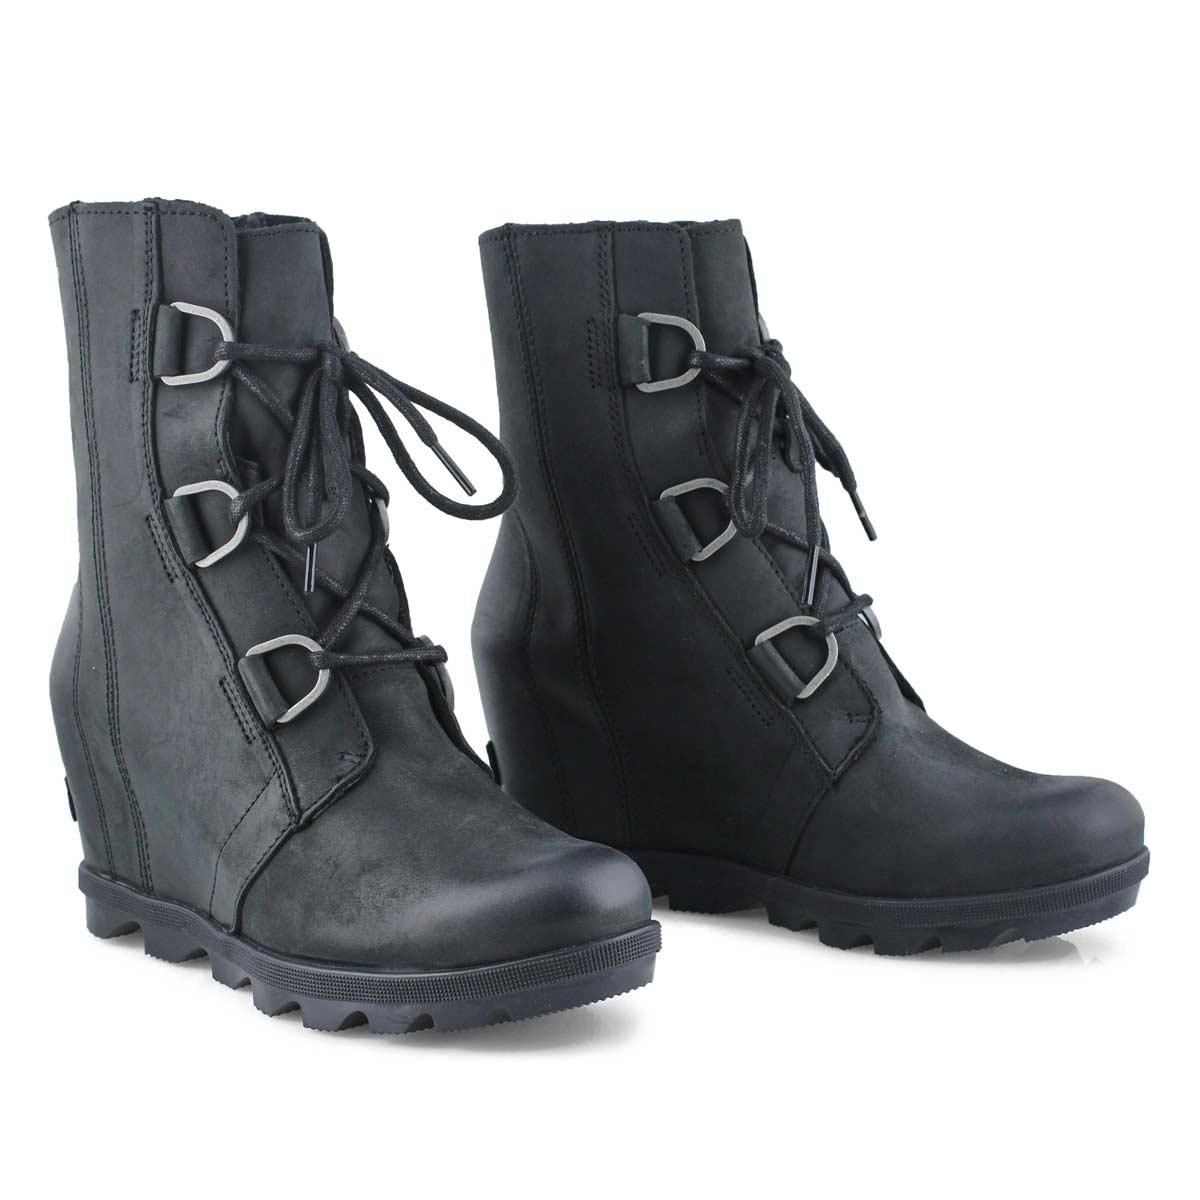 Lds JoanOfArcticWedgeII black wtpf boot